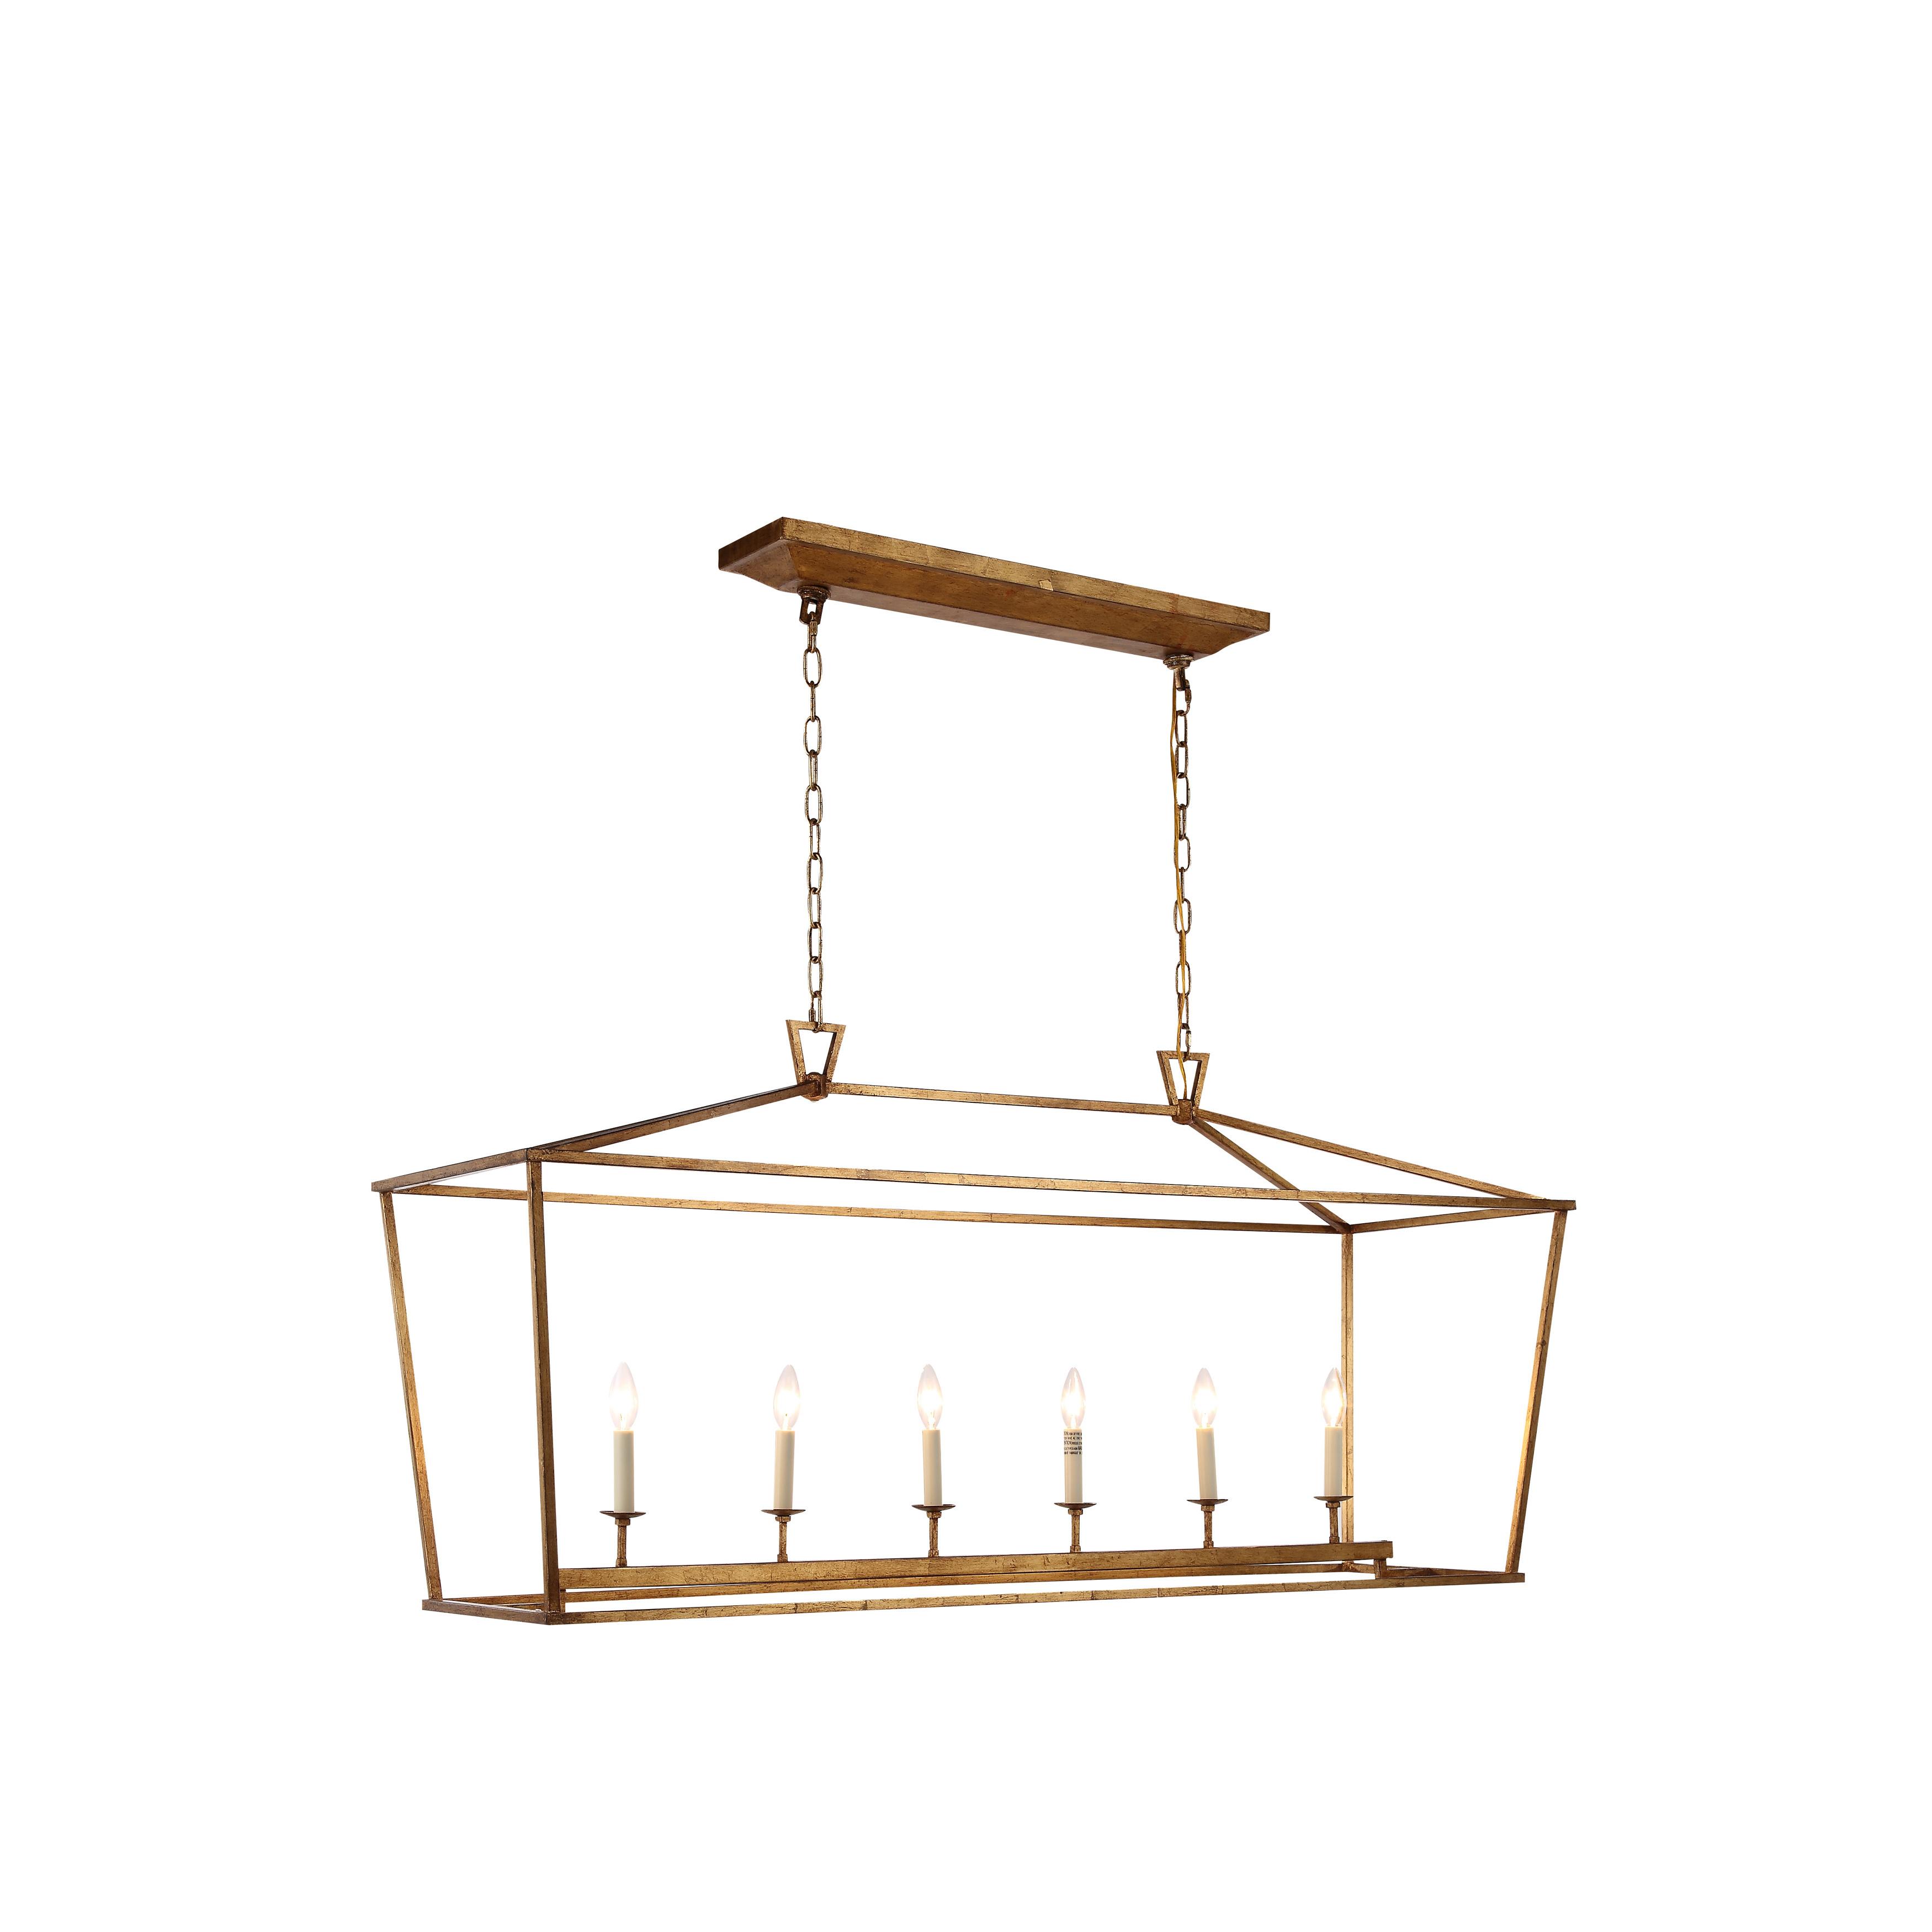 Denmark-Collection-1422-Pendant-Lamp-with-Golden-Iron-Finish-7d3c5132-e881-4e35-9852-f1b9d4cb0f5d